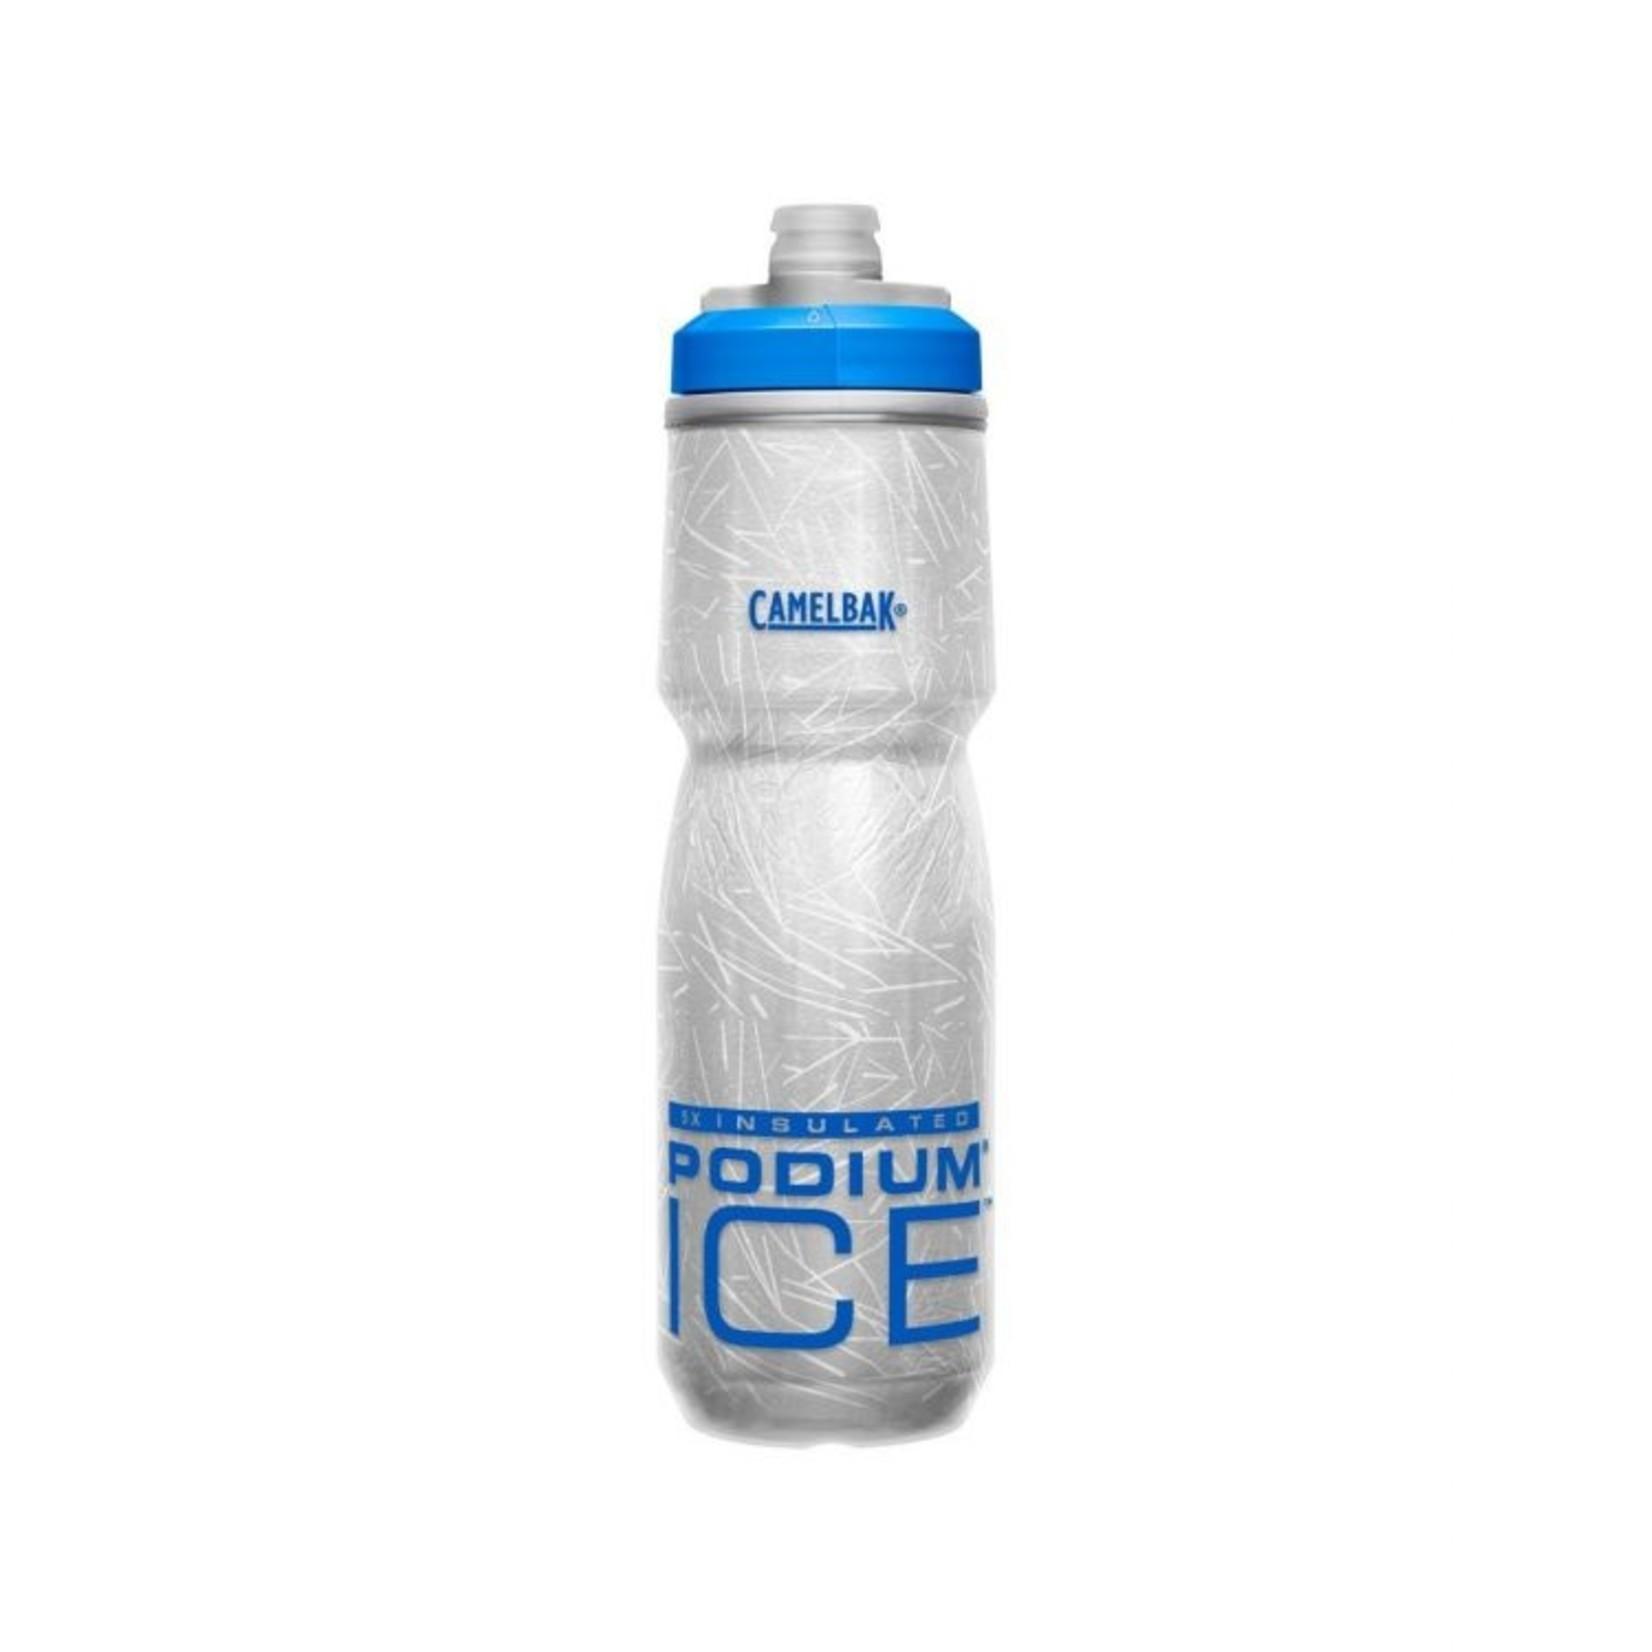 Camelbak Podium ICE 620ml Oxford